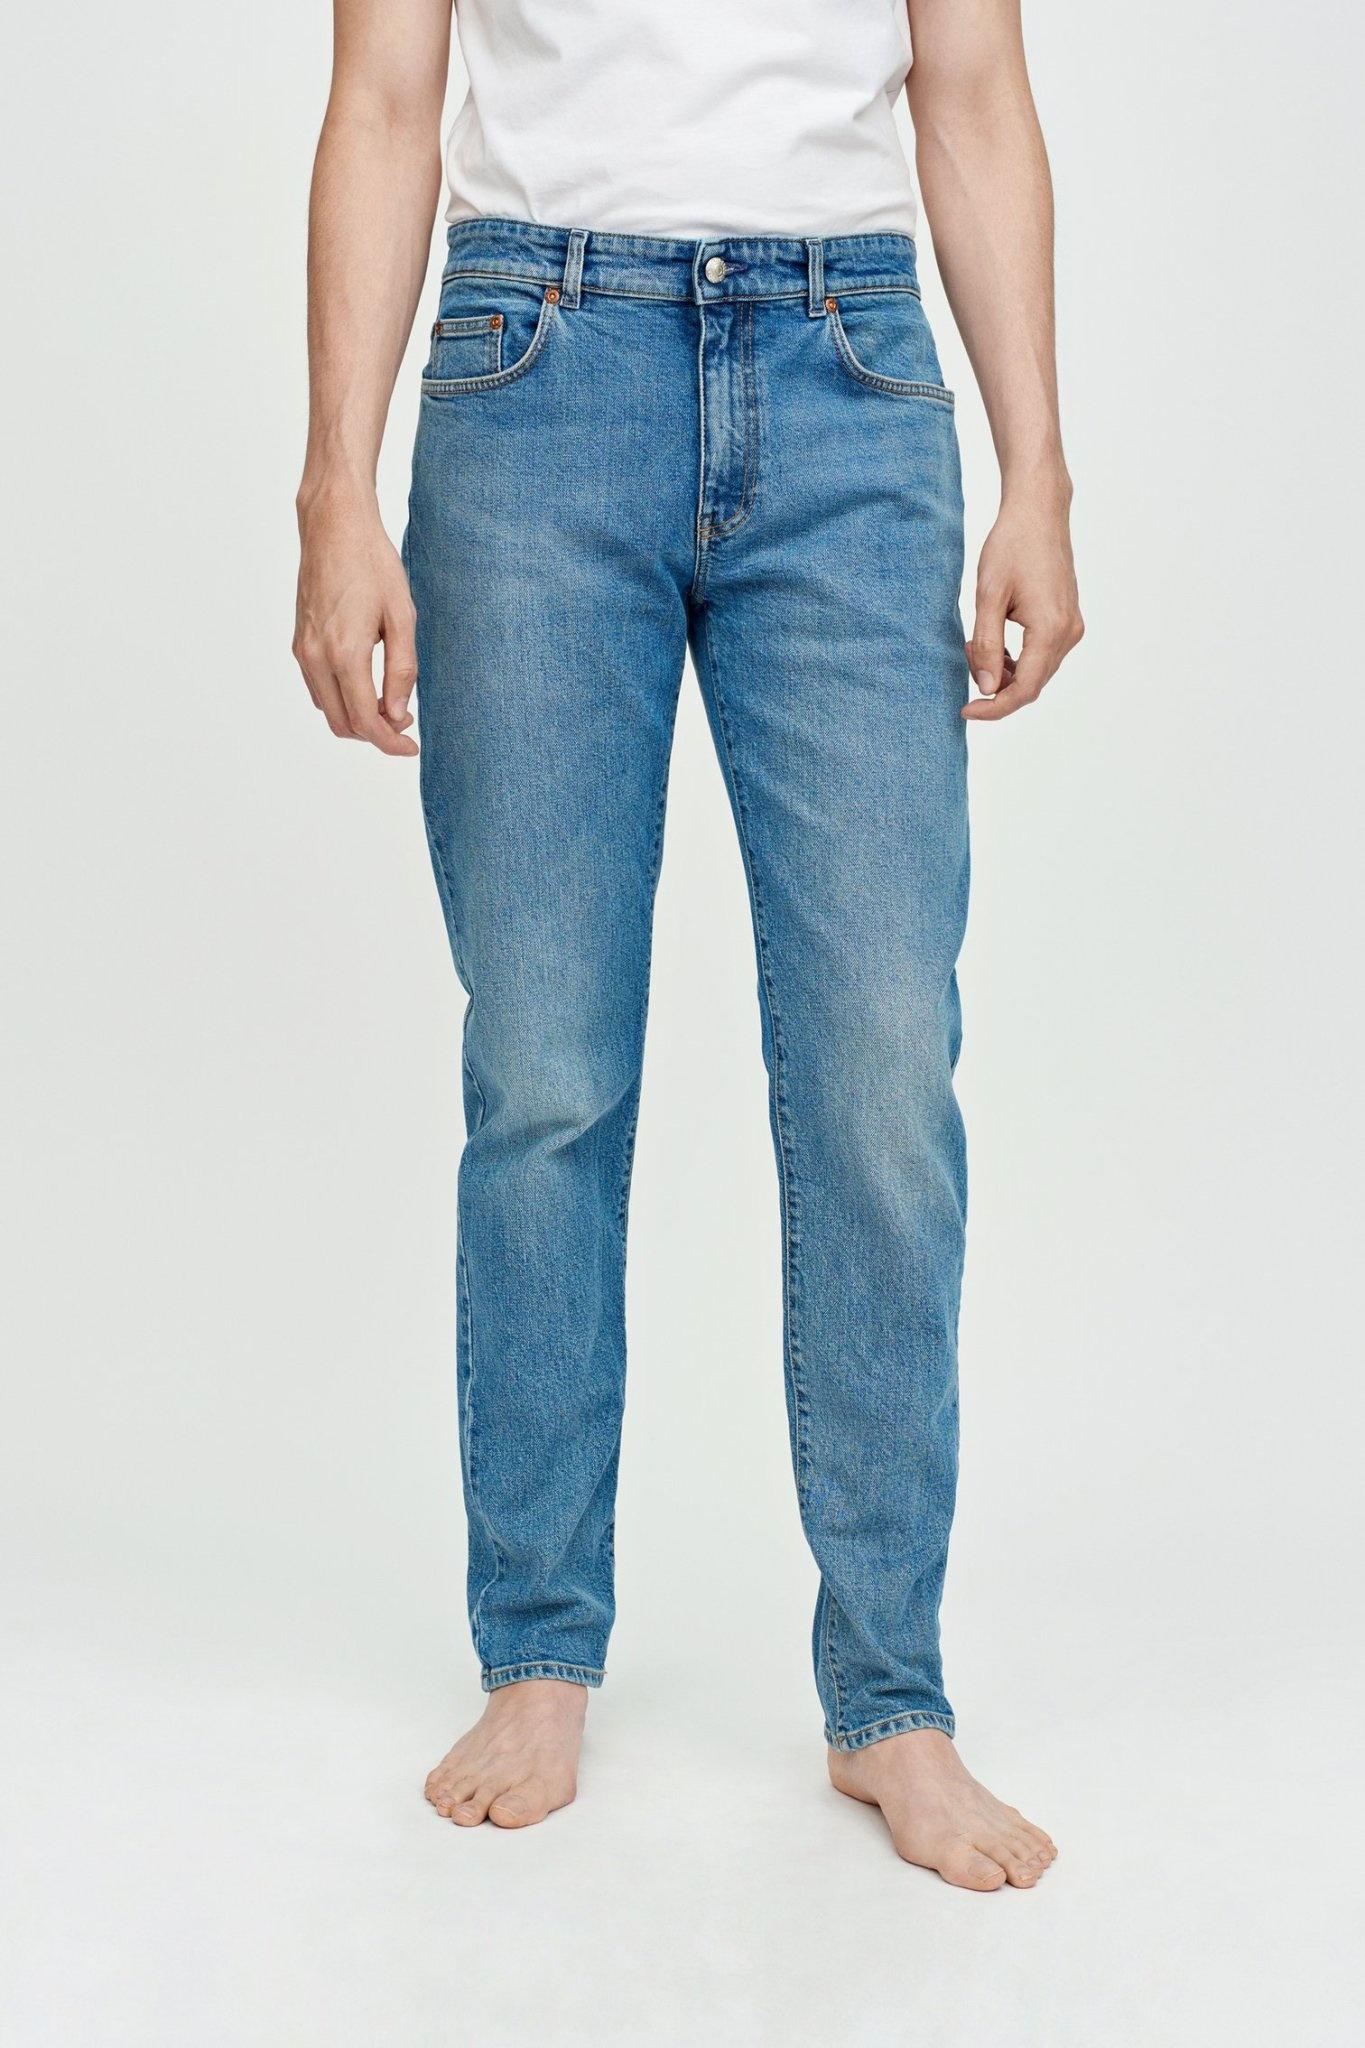 Shady B Jeans - True Blue 6-1